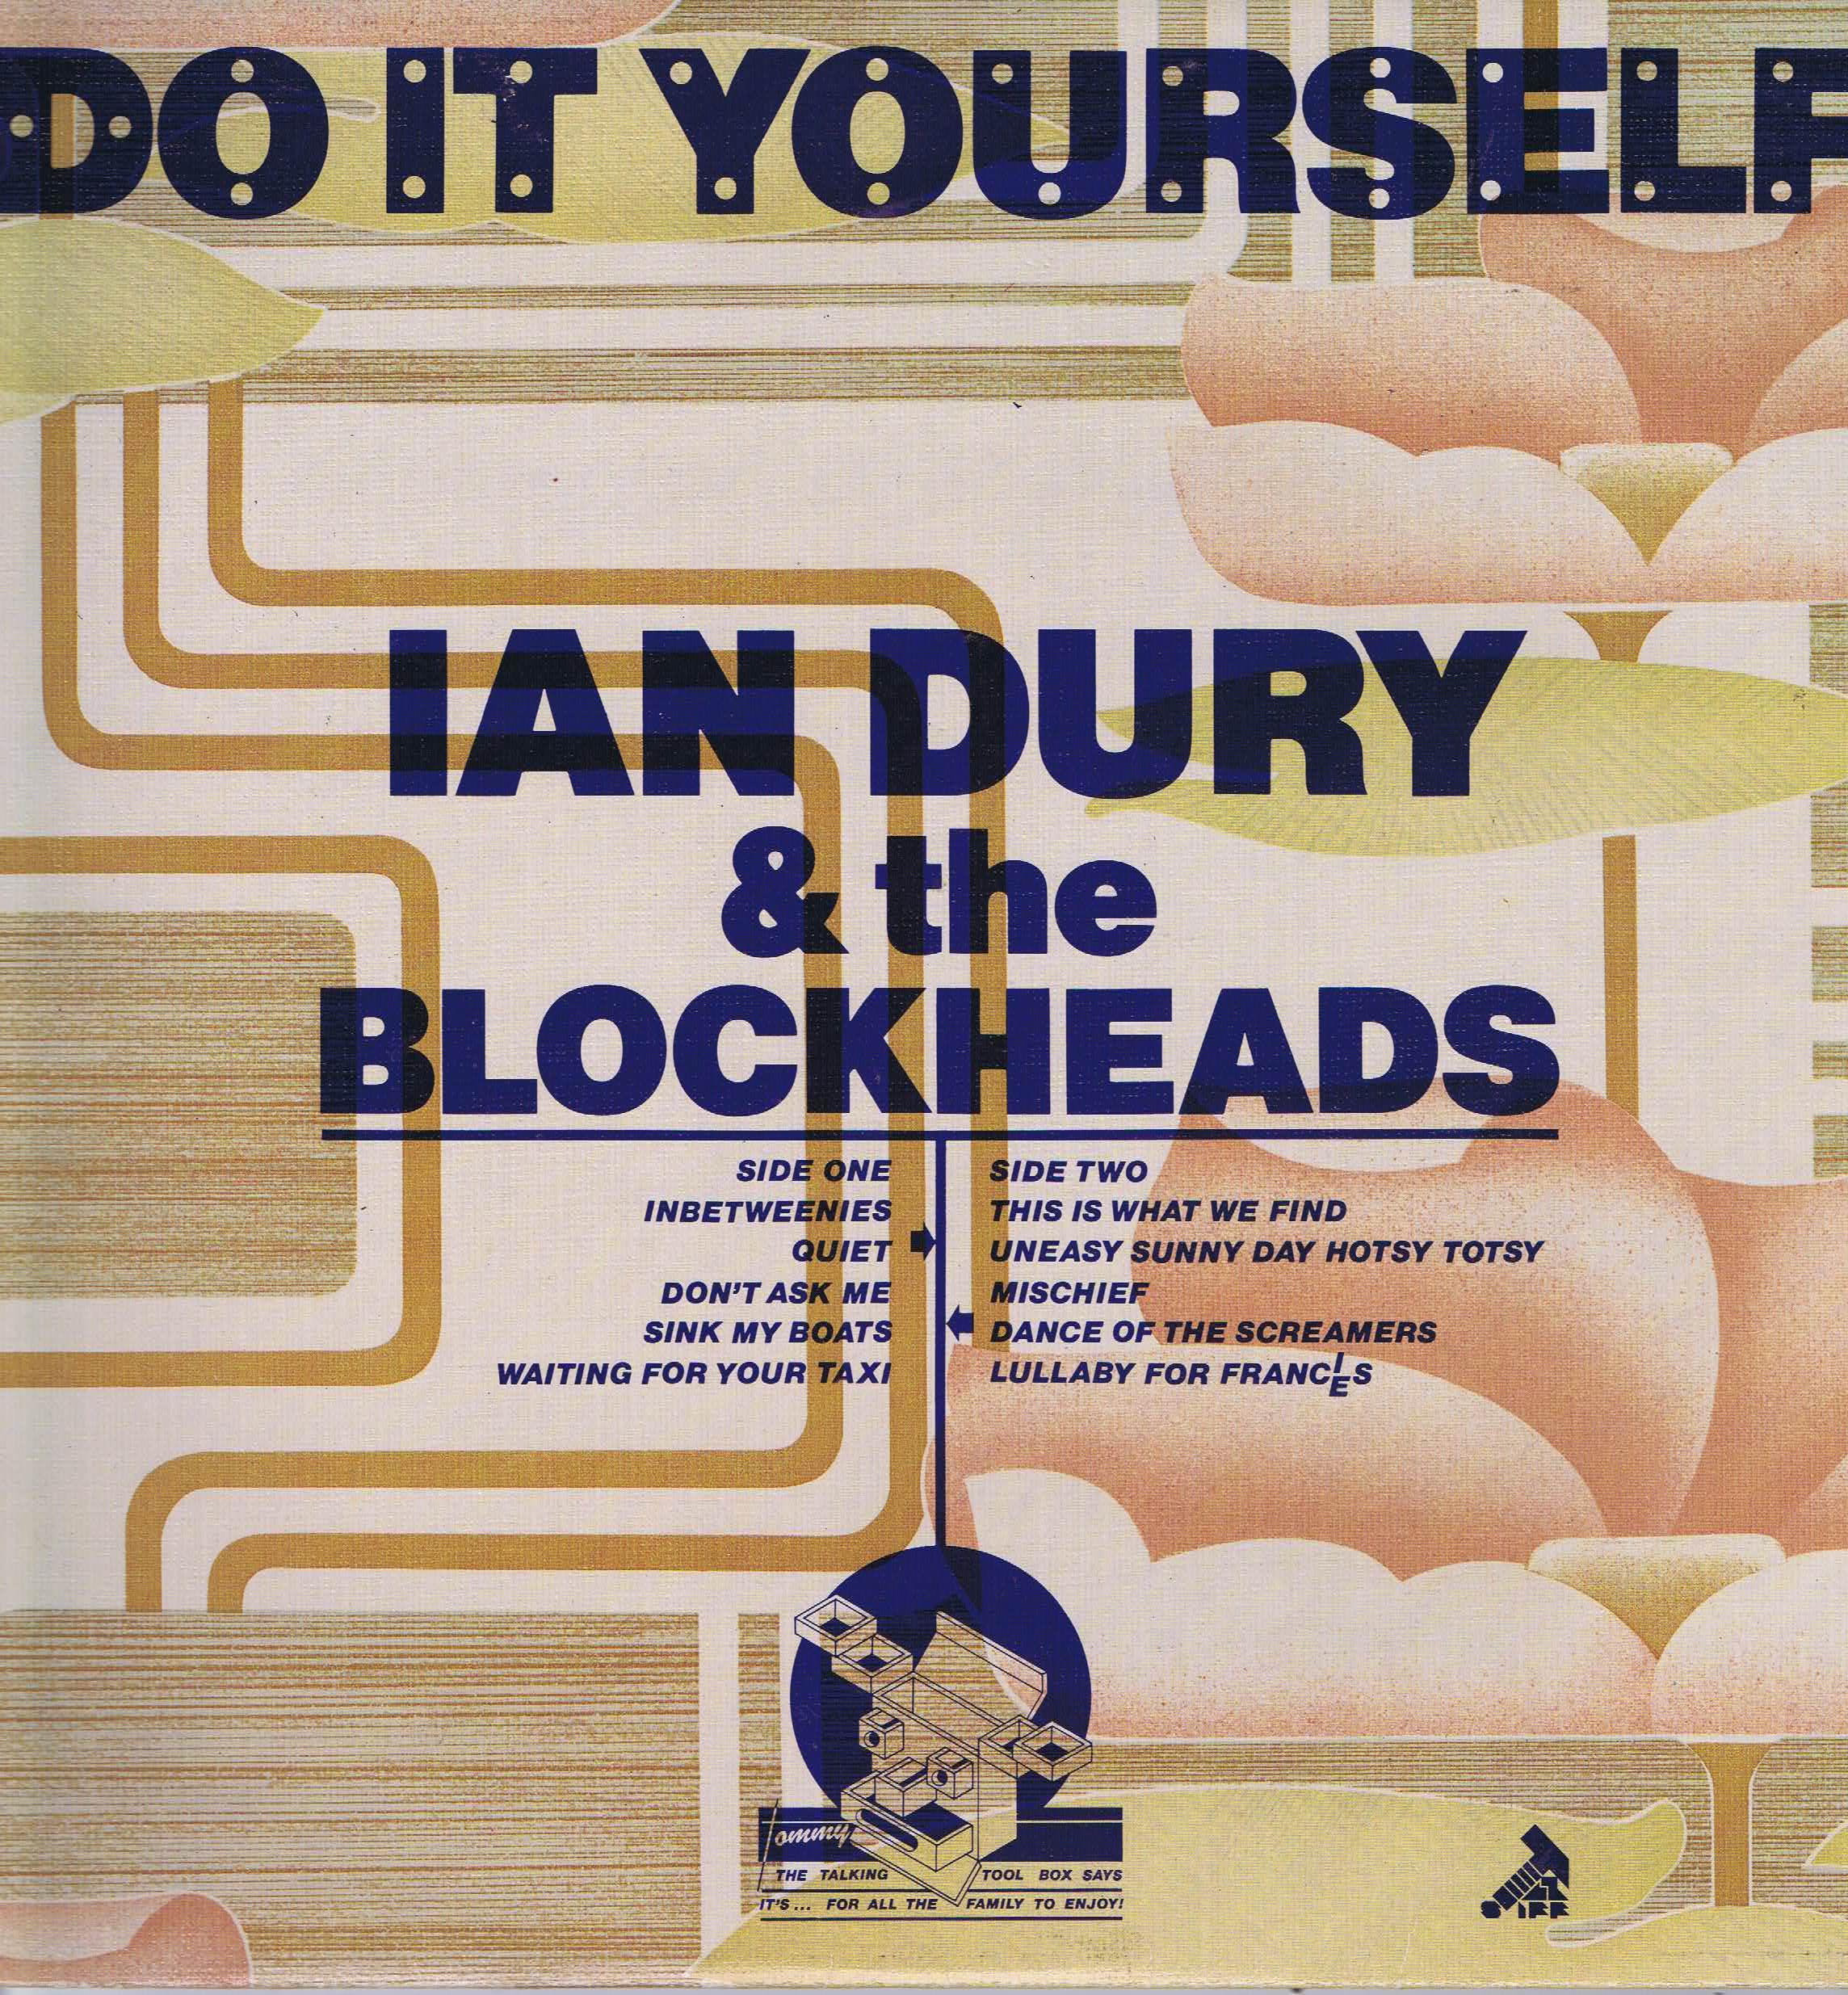 ian dury the blockheads do it yourself seez 14 lp vinyl record wax vinyl records. Black Bedroom Furniture Sets. Home Design Ideas